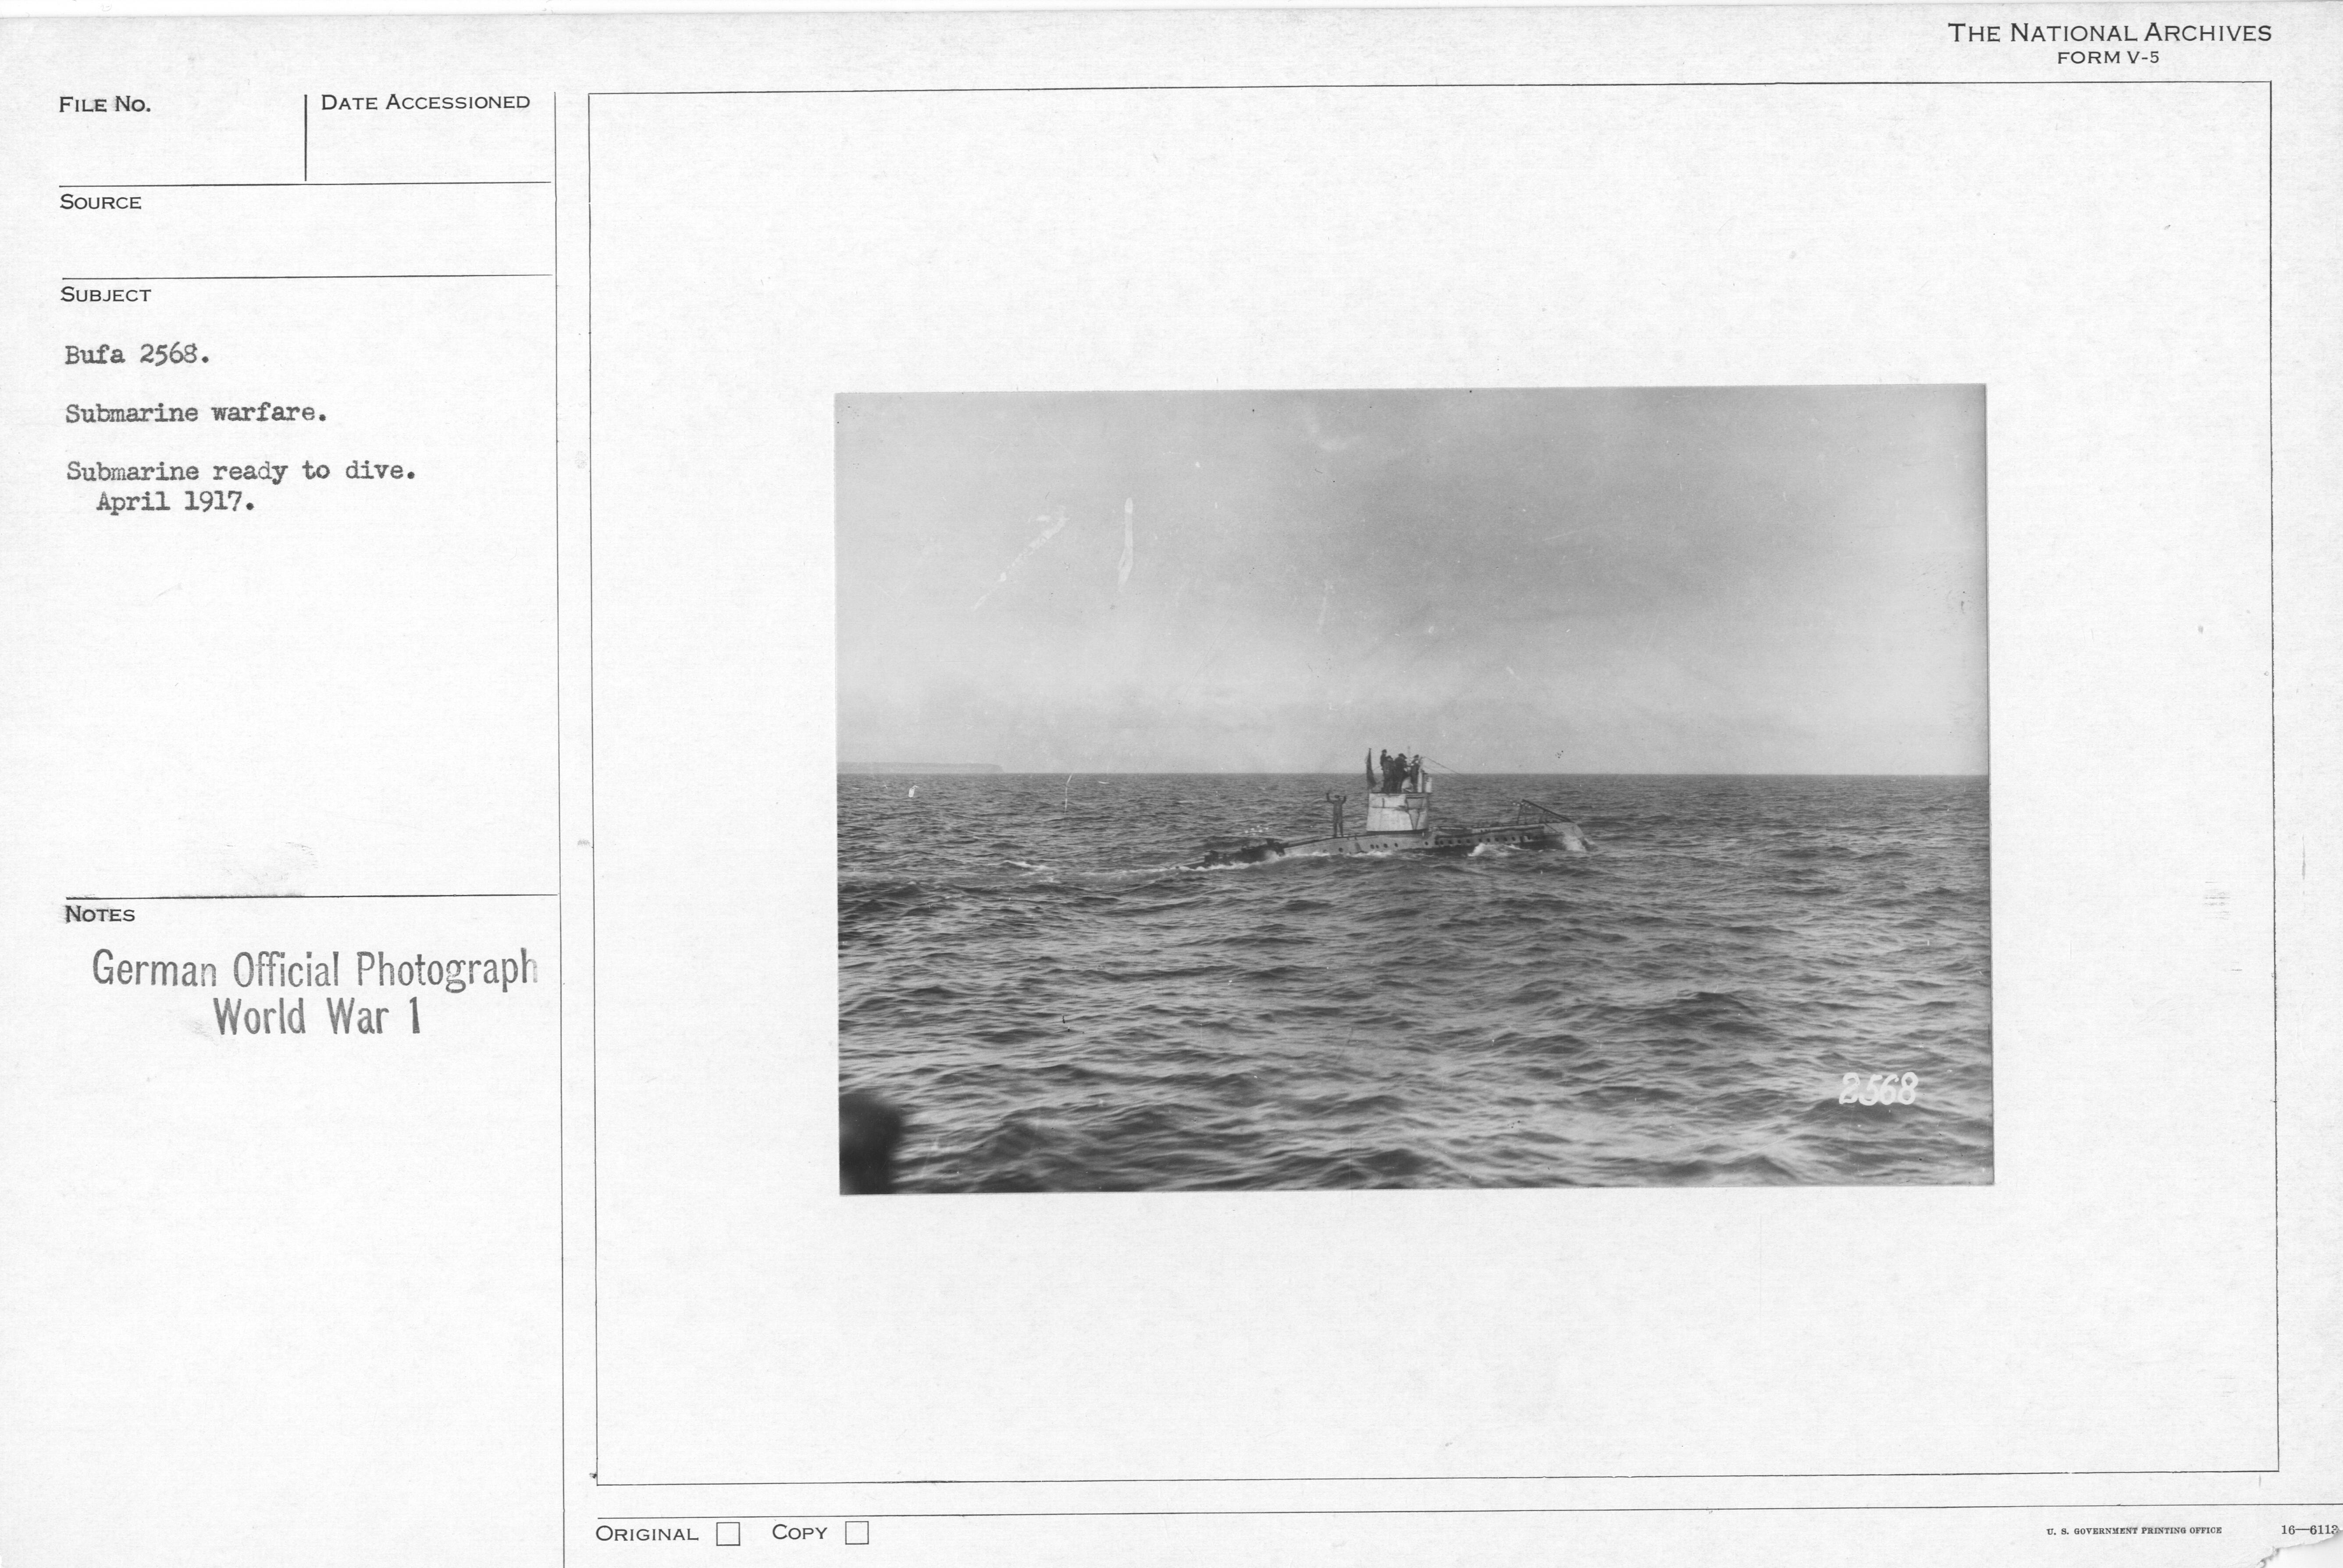 Submarine warfare. Submarine ready to drive. April 1917